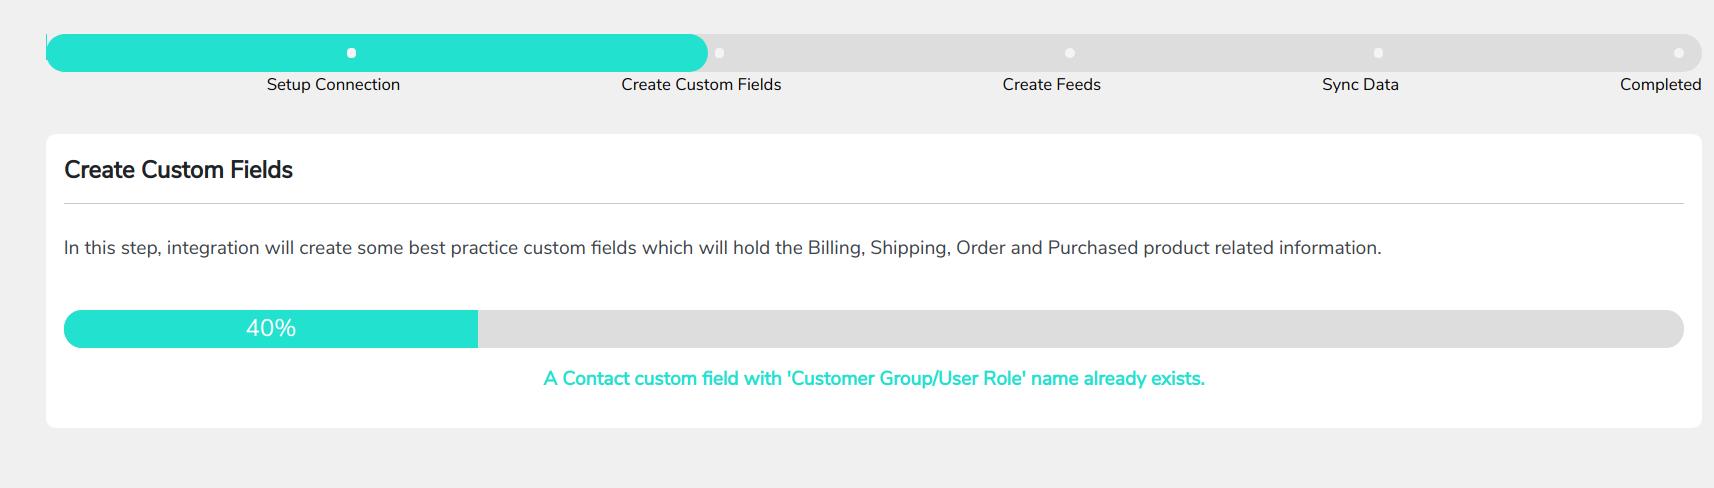 create custom feeds details